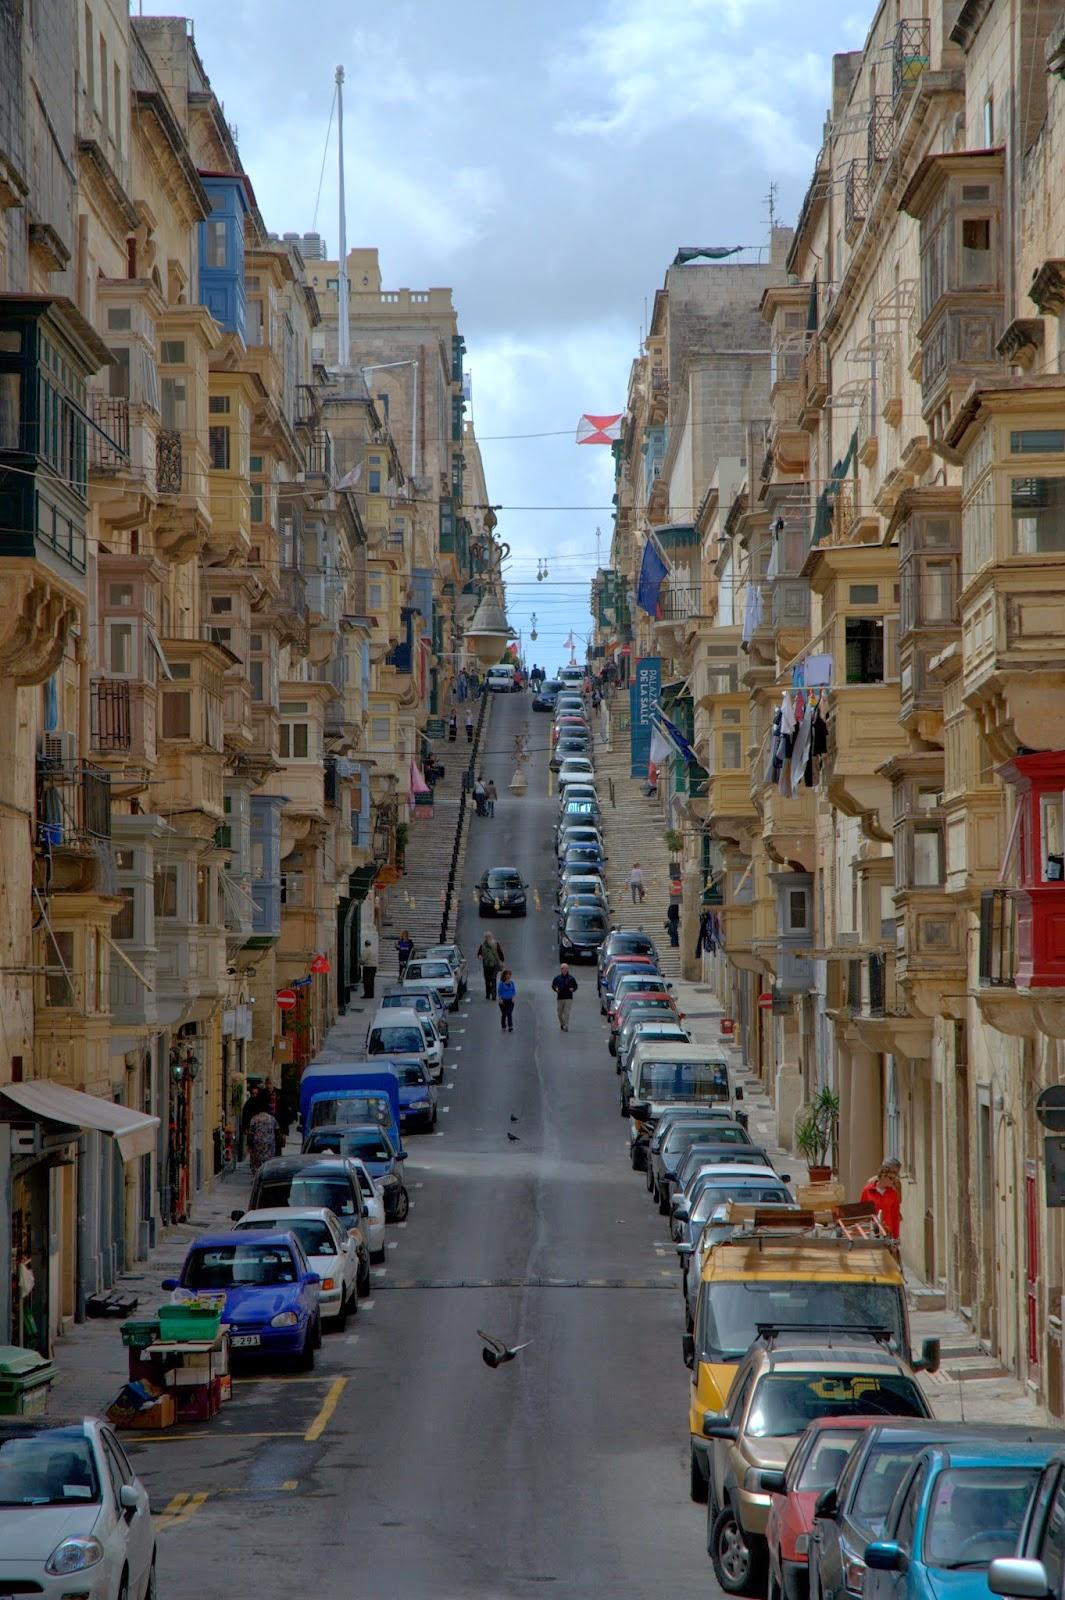 ulice na Malcie i kamienice